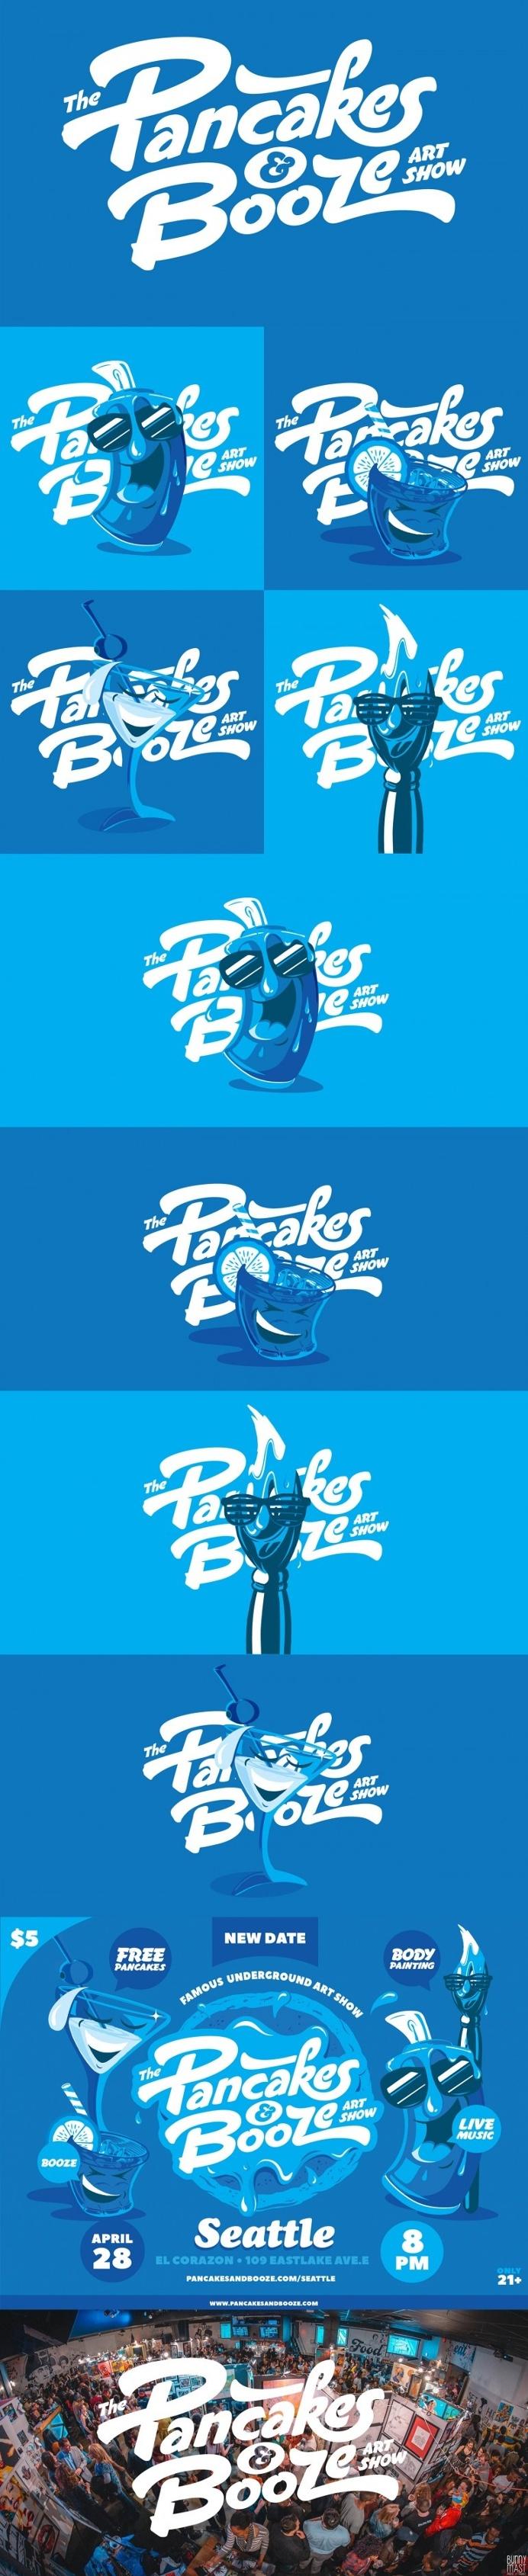 best logo design pancakes booze art images on designspiration